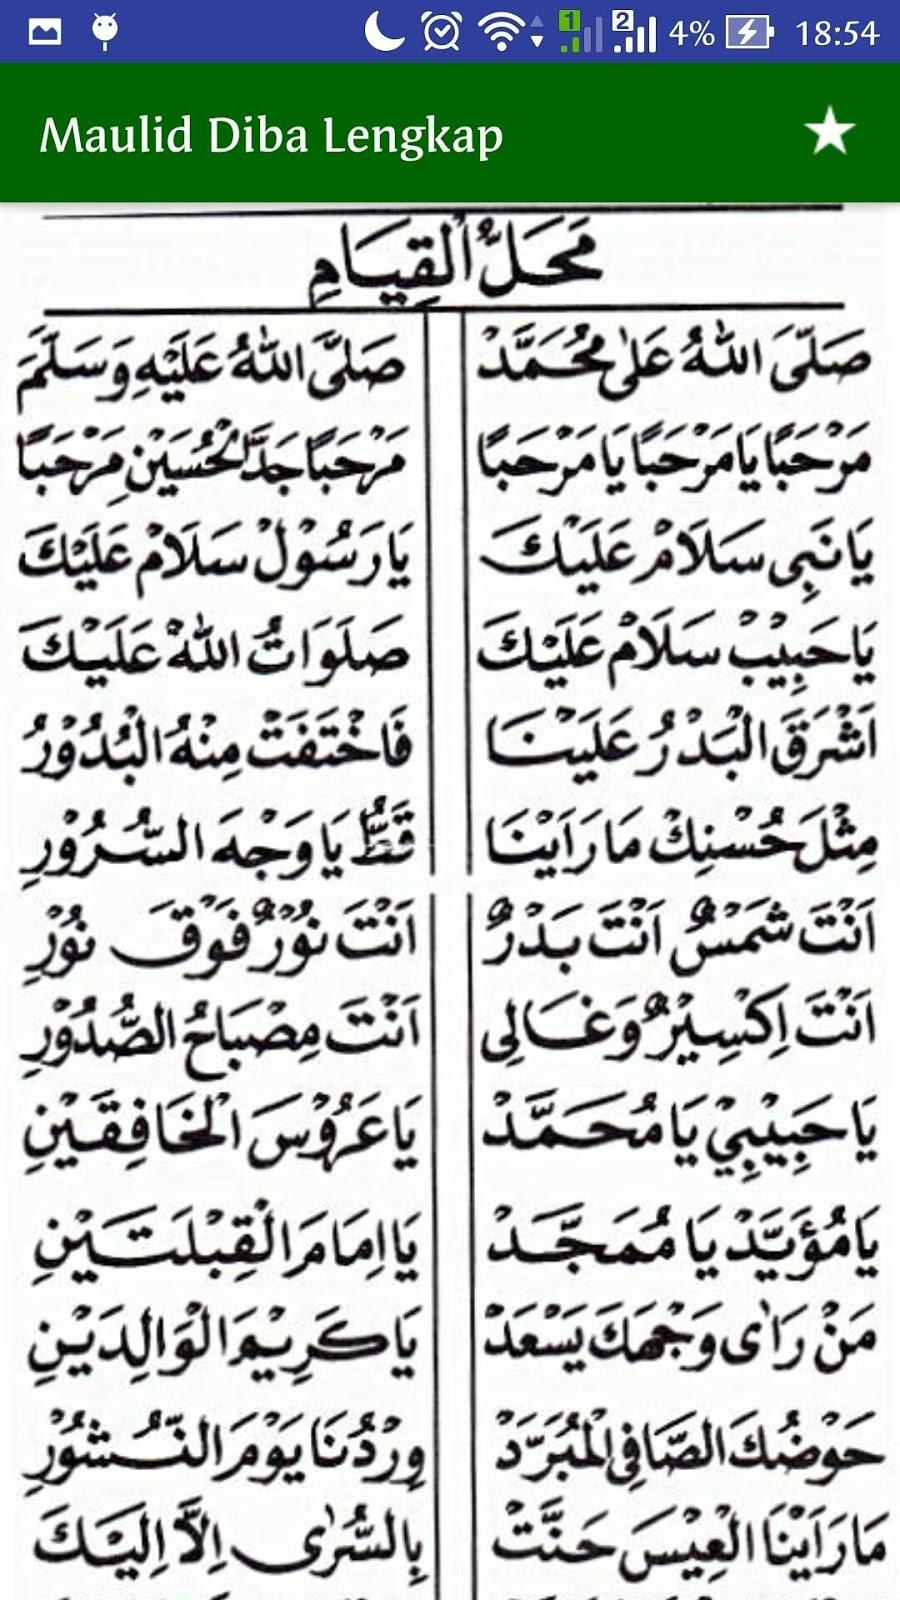 Download Sholawat Syababul Kheir : download, sholawat, syababul, kheir, Lirik, Syiir, Habib, Syech, Mahalul, Qiyam